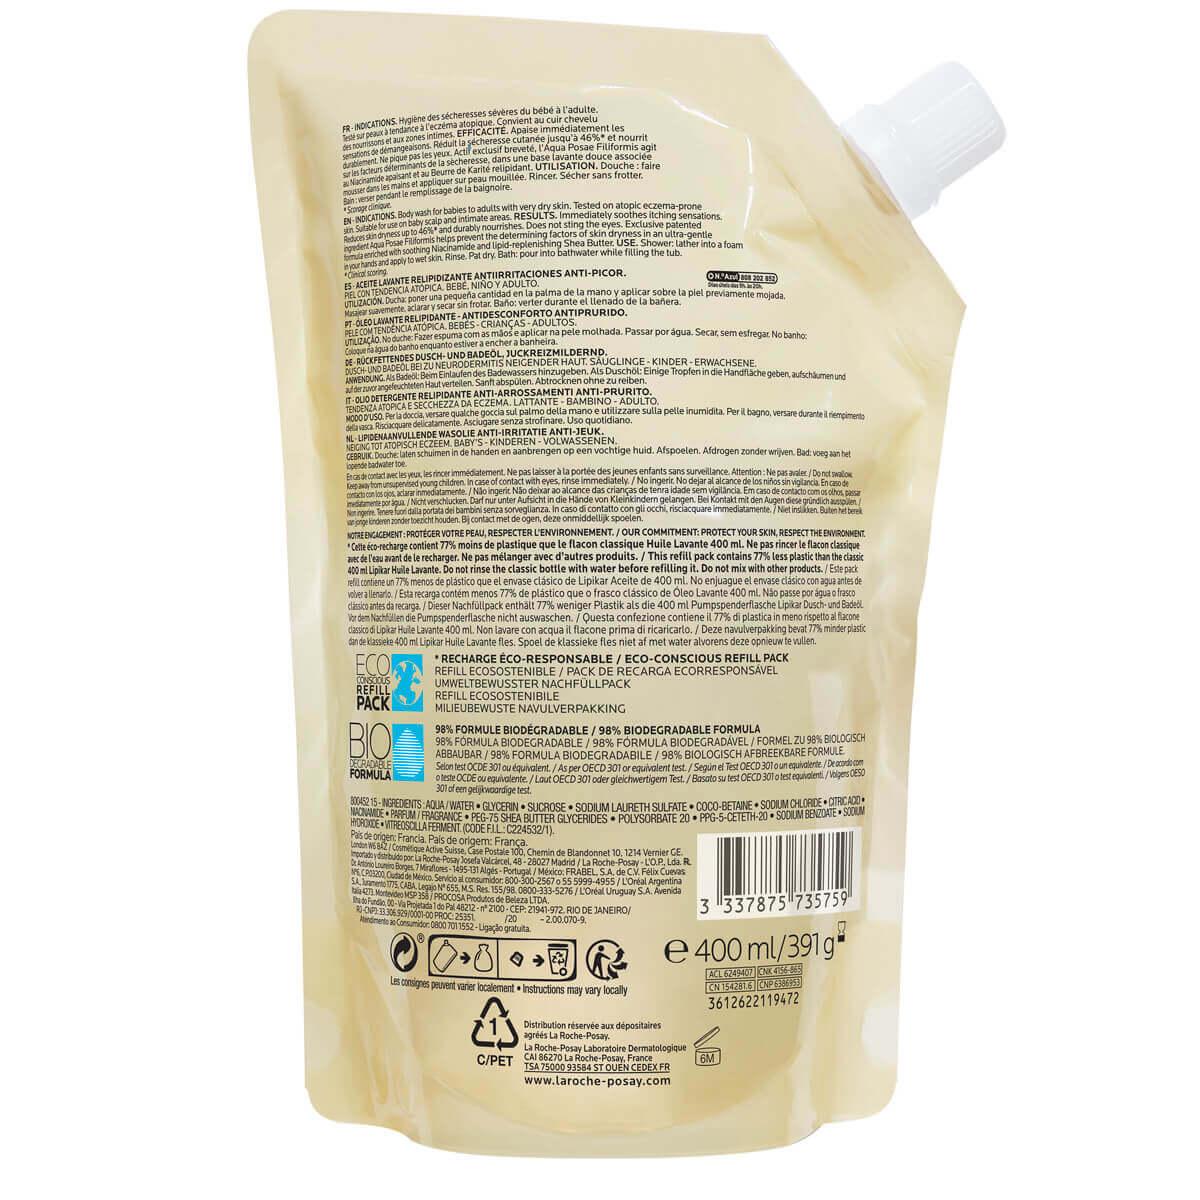 LaRochePosay-Product-Eczema-Lipikar-Eco-conscious-Refill-CleansingOilAP-400ml-3337875735759-BWS